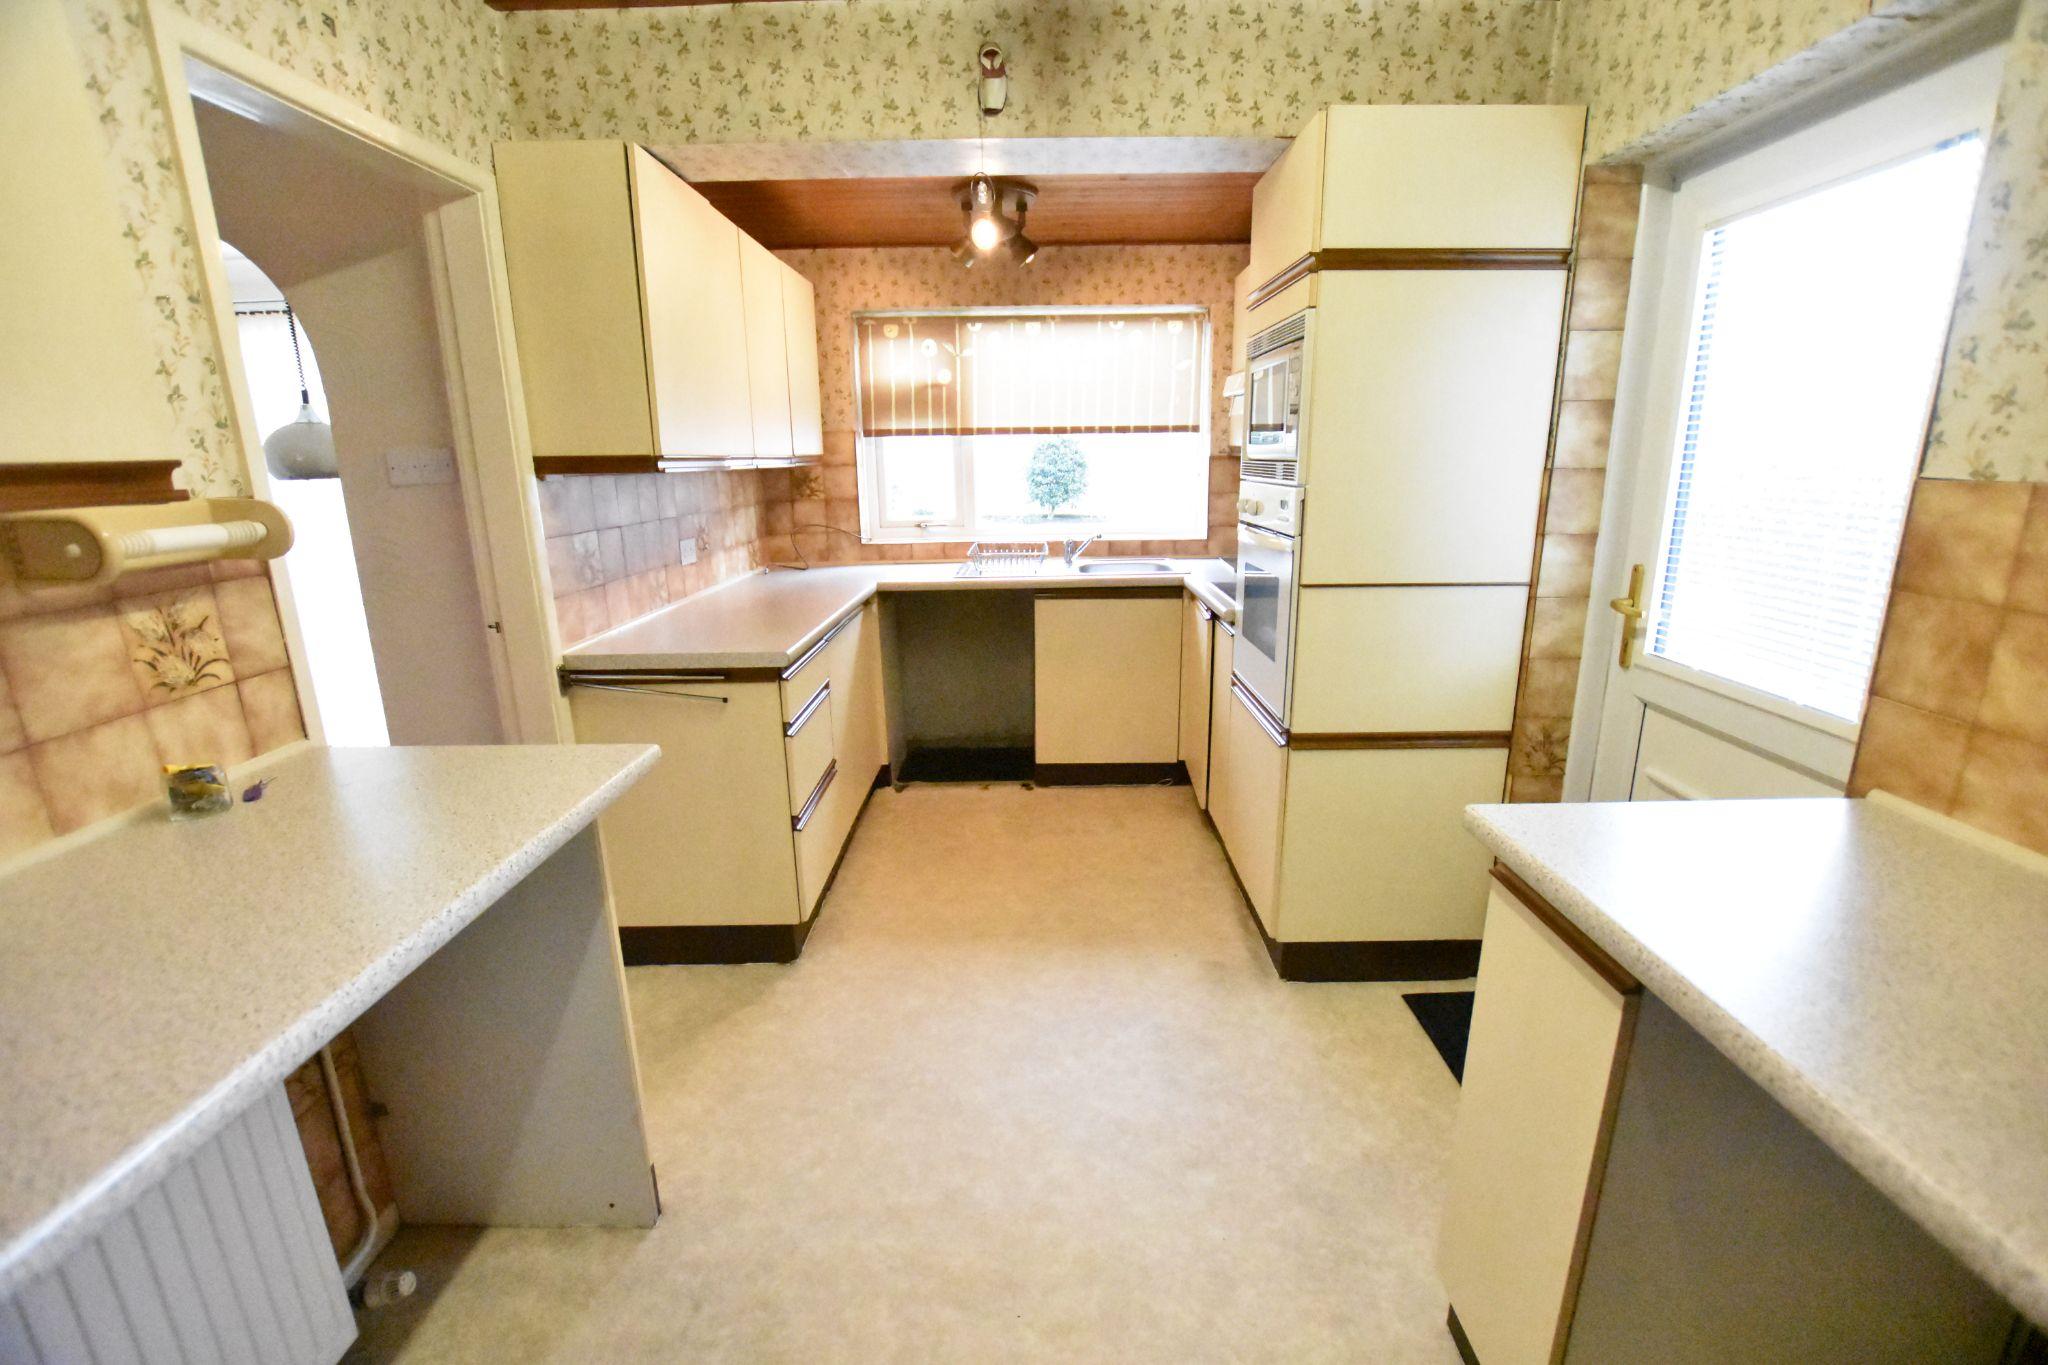 3 bedroom semi-detached house Sold STC in Preston - Kitchen